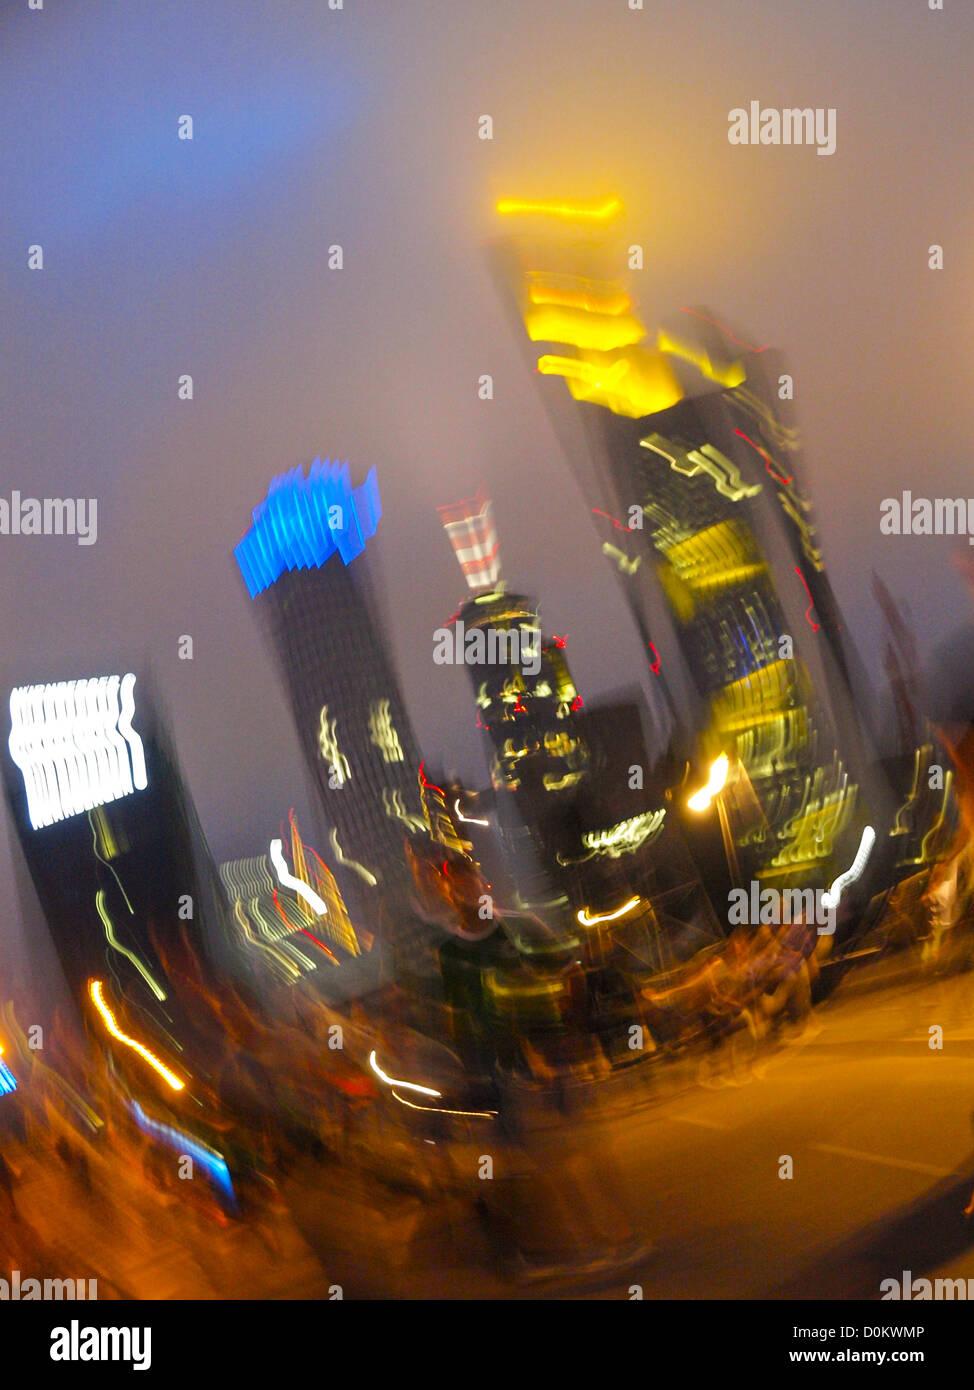 financial centre downtown, euro, Germany, Hessen, Frankfurt a. Main - Stock Image